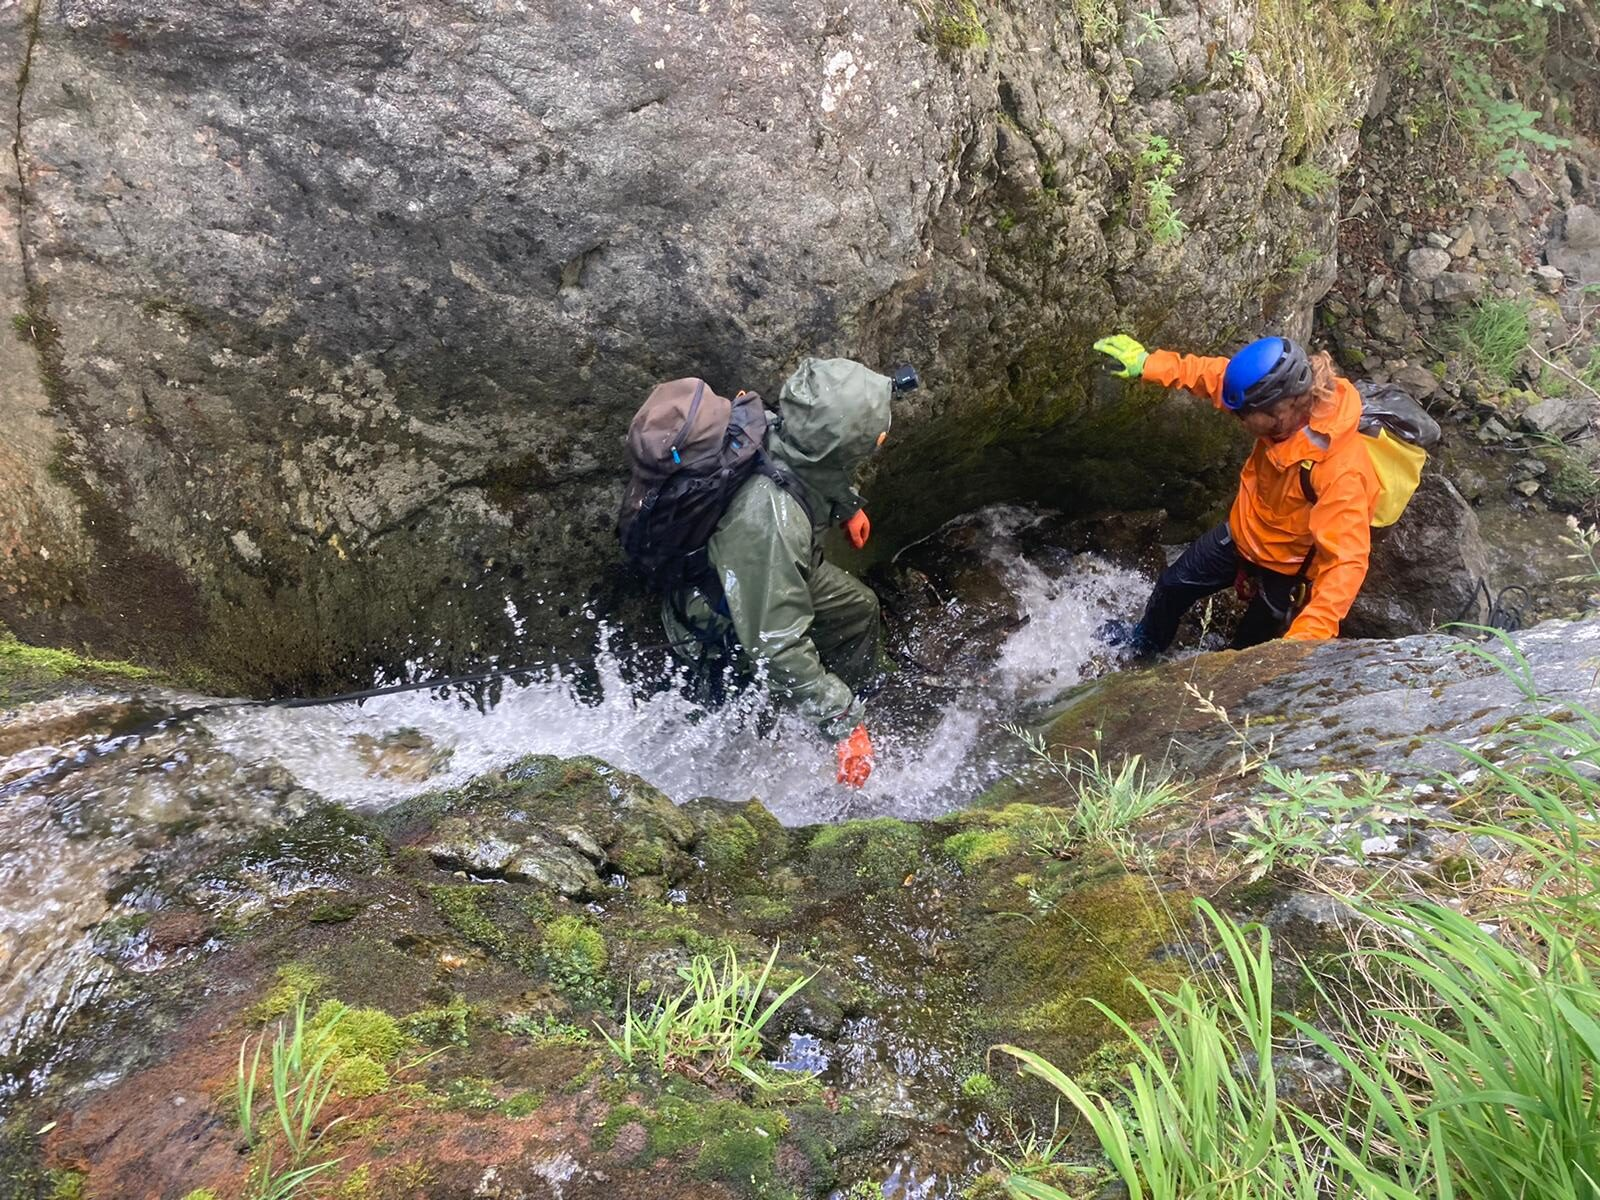 person on Alaska canyoneering adventure